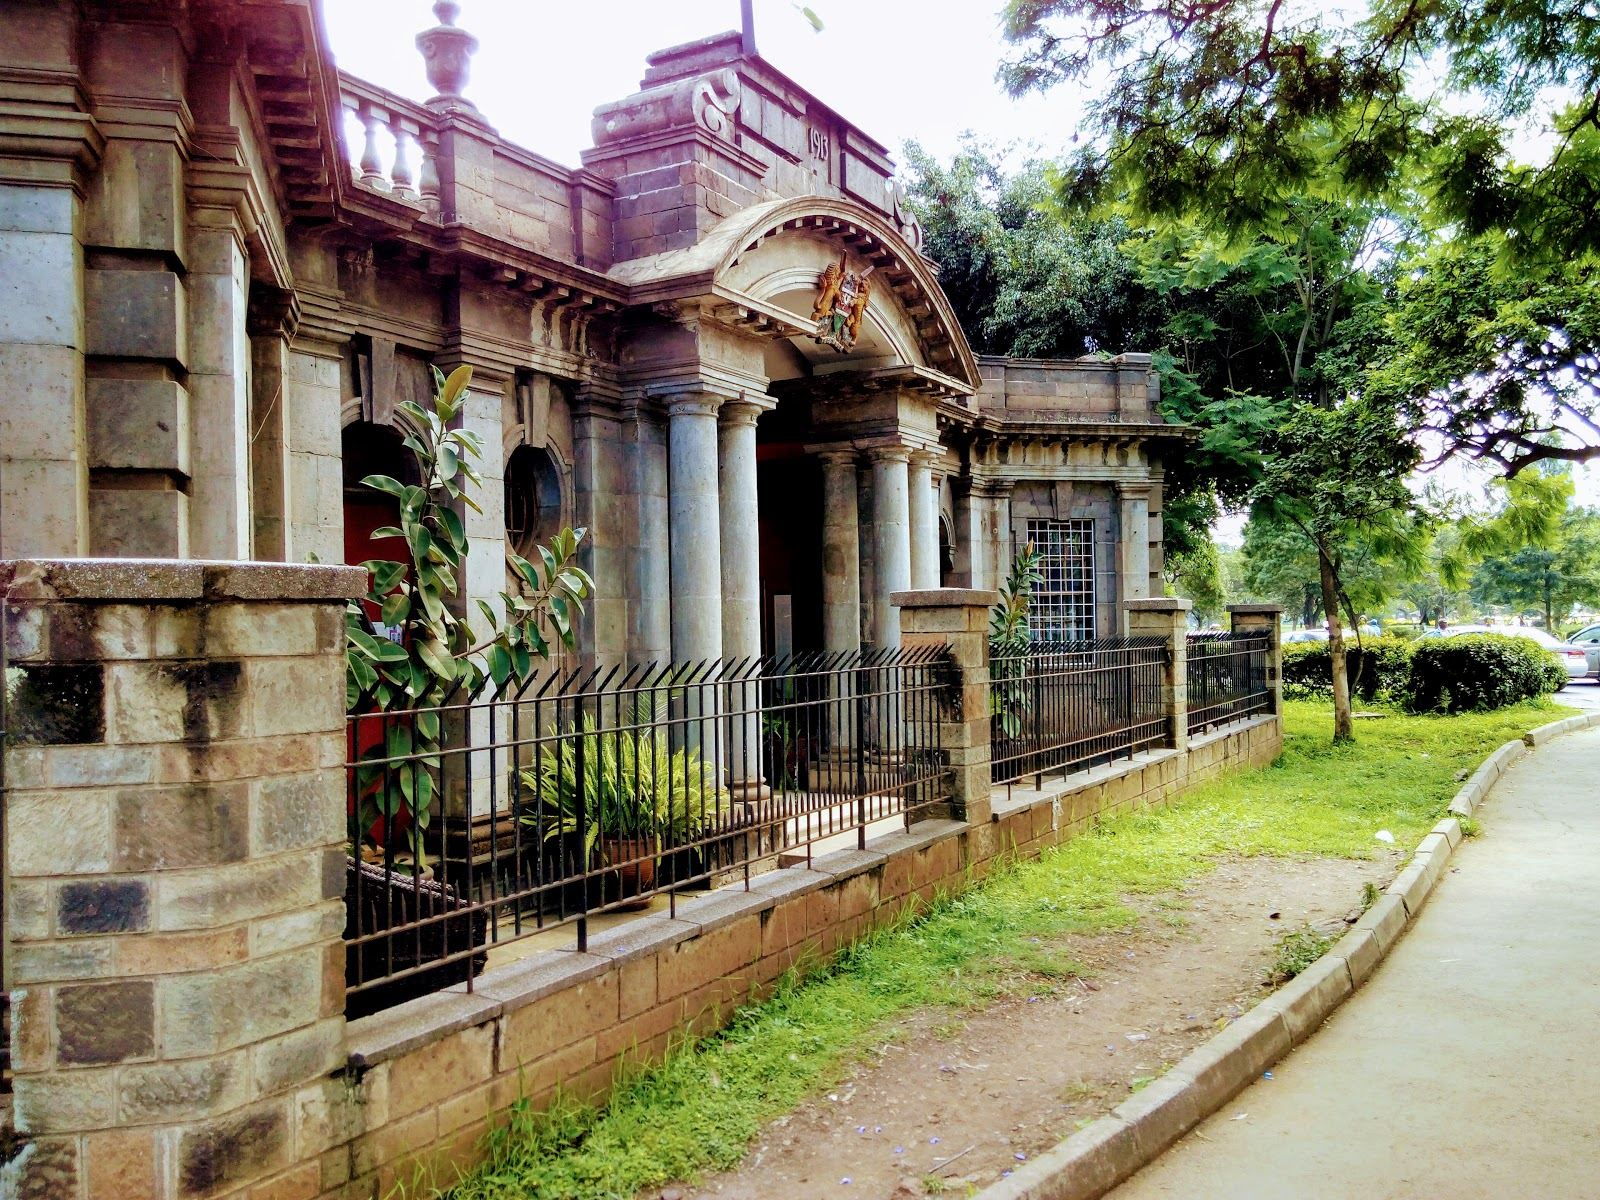 Nairobi Gallery | zuru Kenya | historical sites to visit in Nairobi